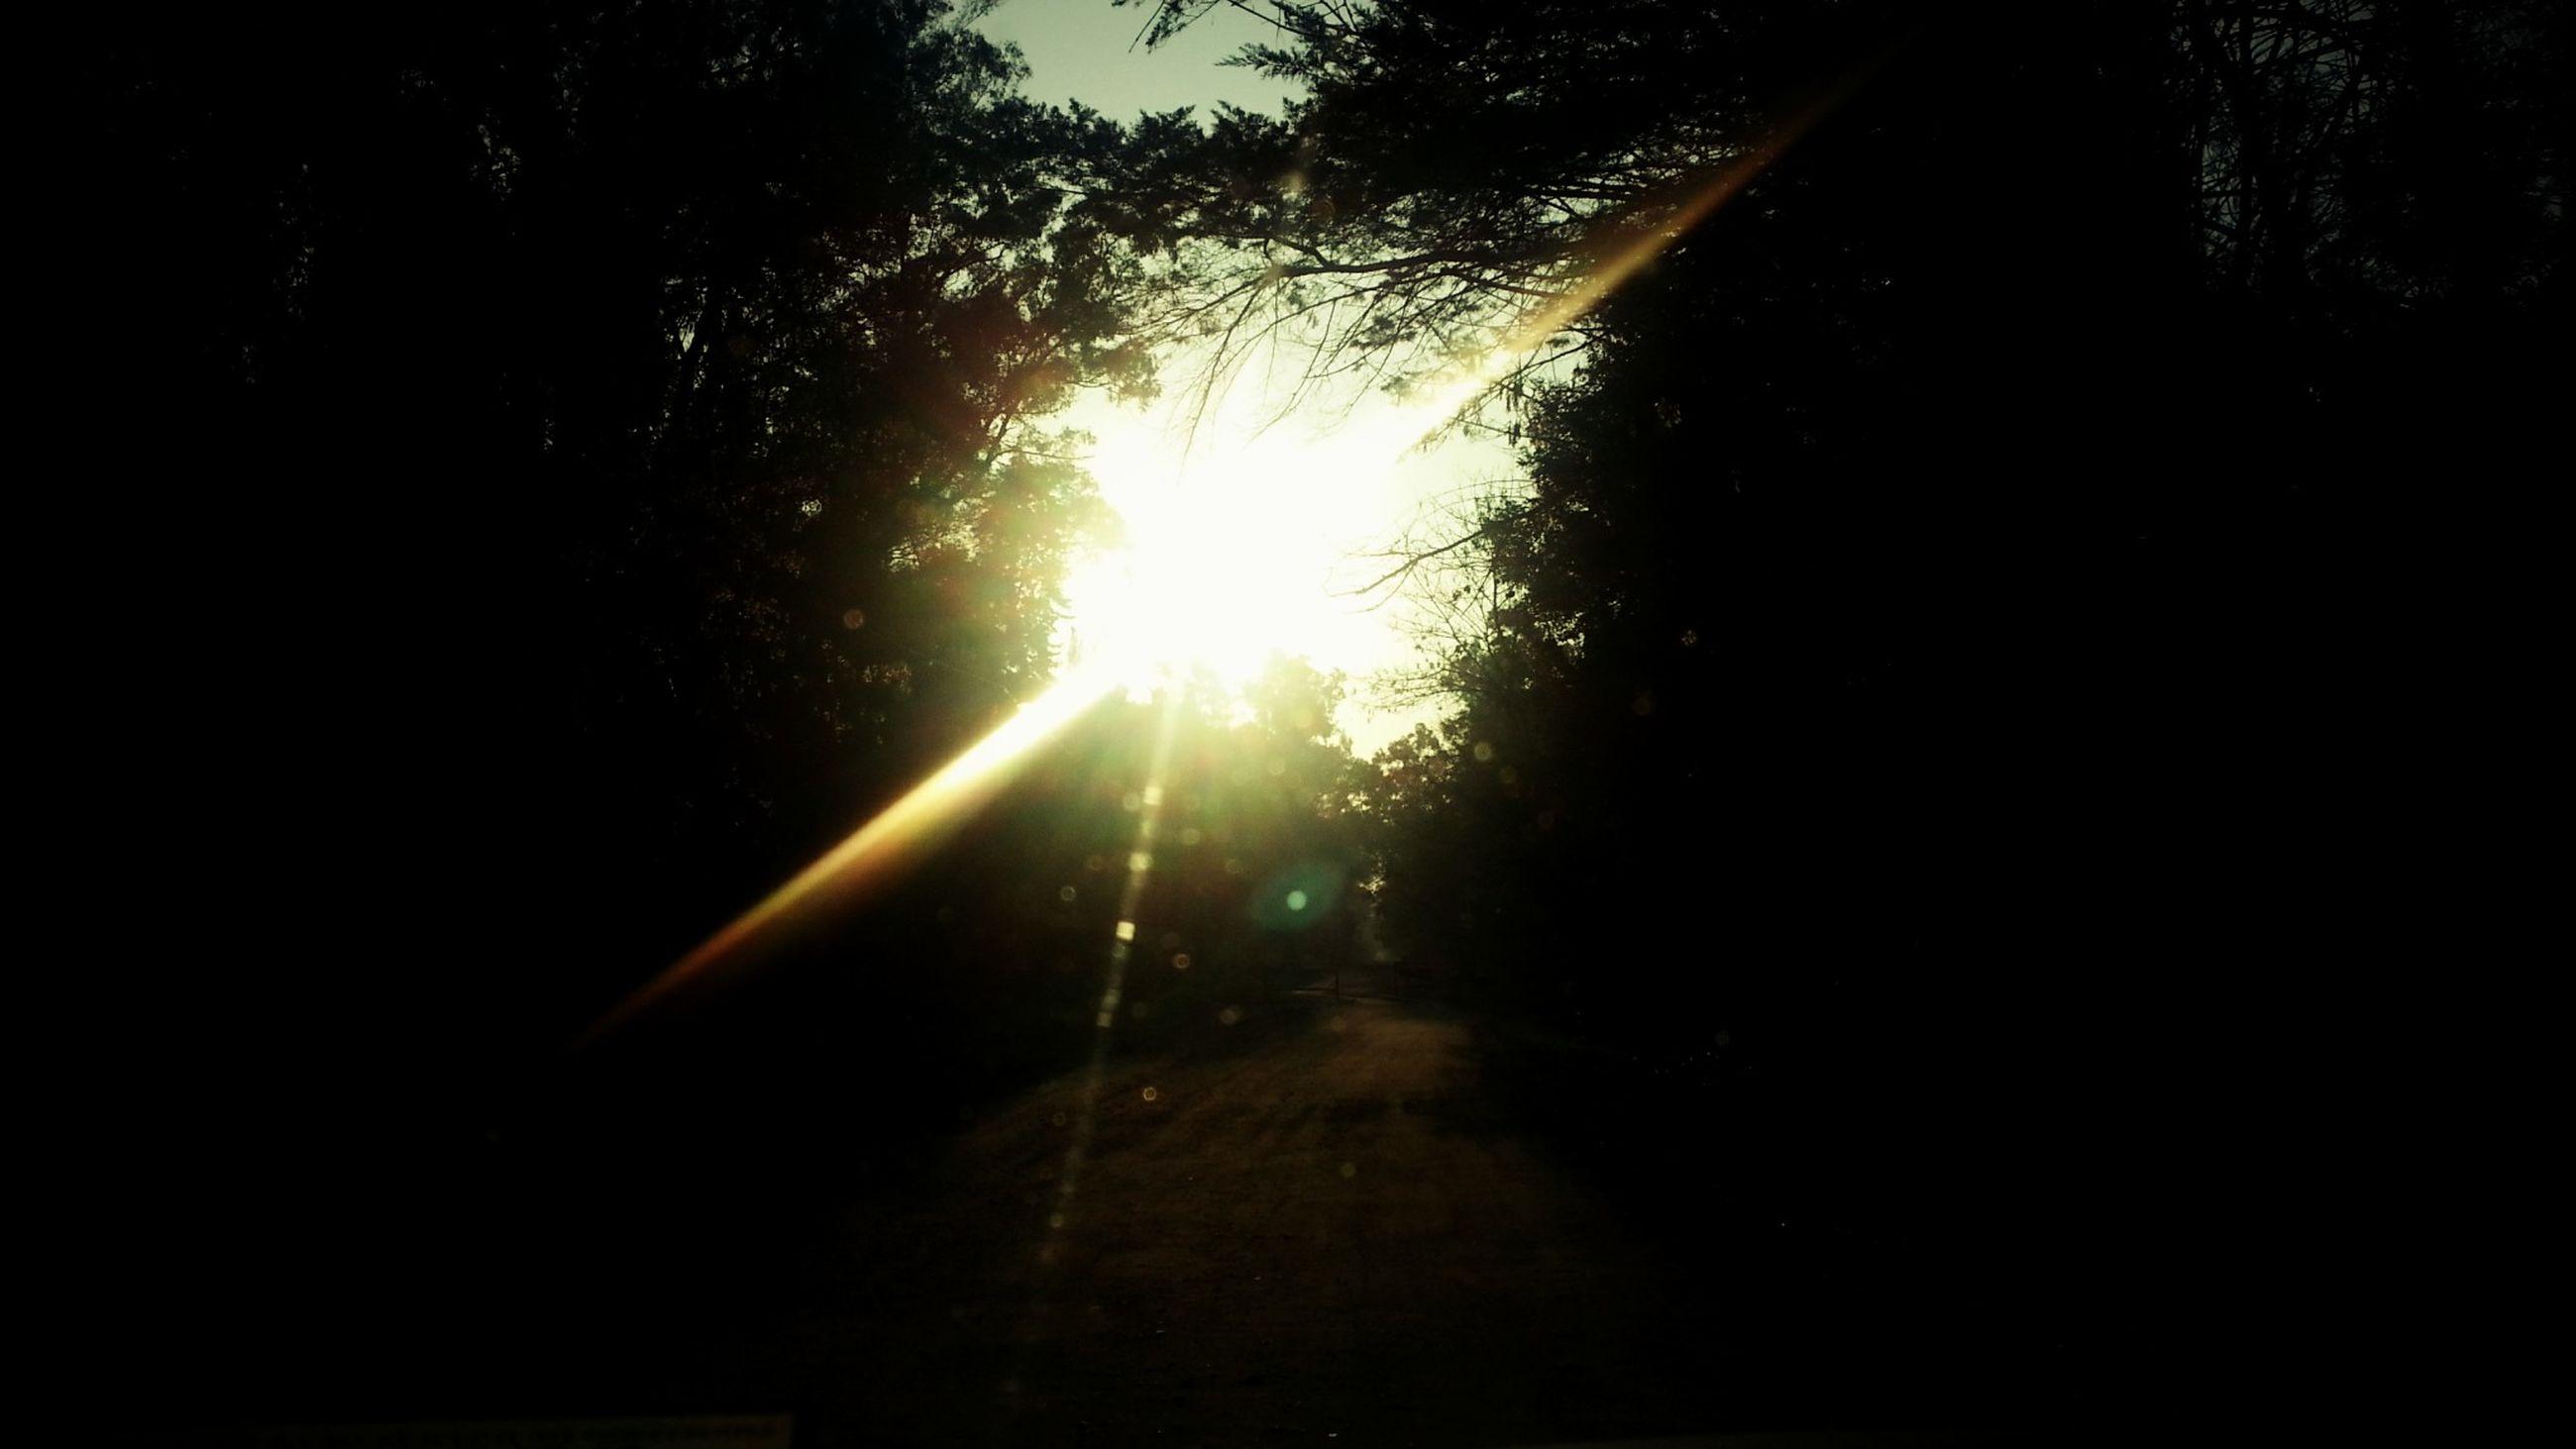 sun, tree, transportation, sunbeam, the way forward, lens flare, sunlight, silhouette, road, sunset, vanishing point, diminishing perspective, street, car, back lit, nature, mode of transport, tranquility, dark, land vehicle